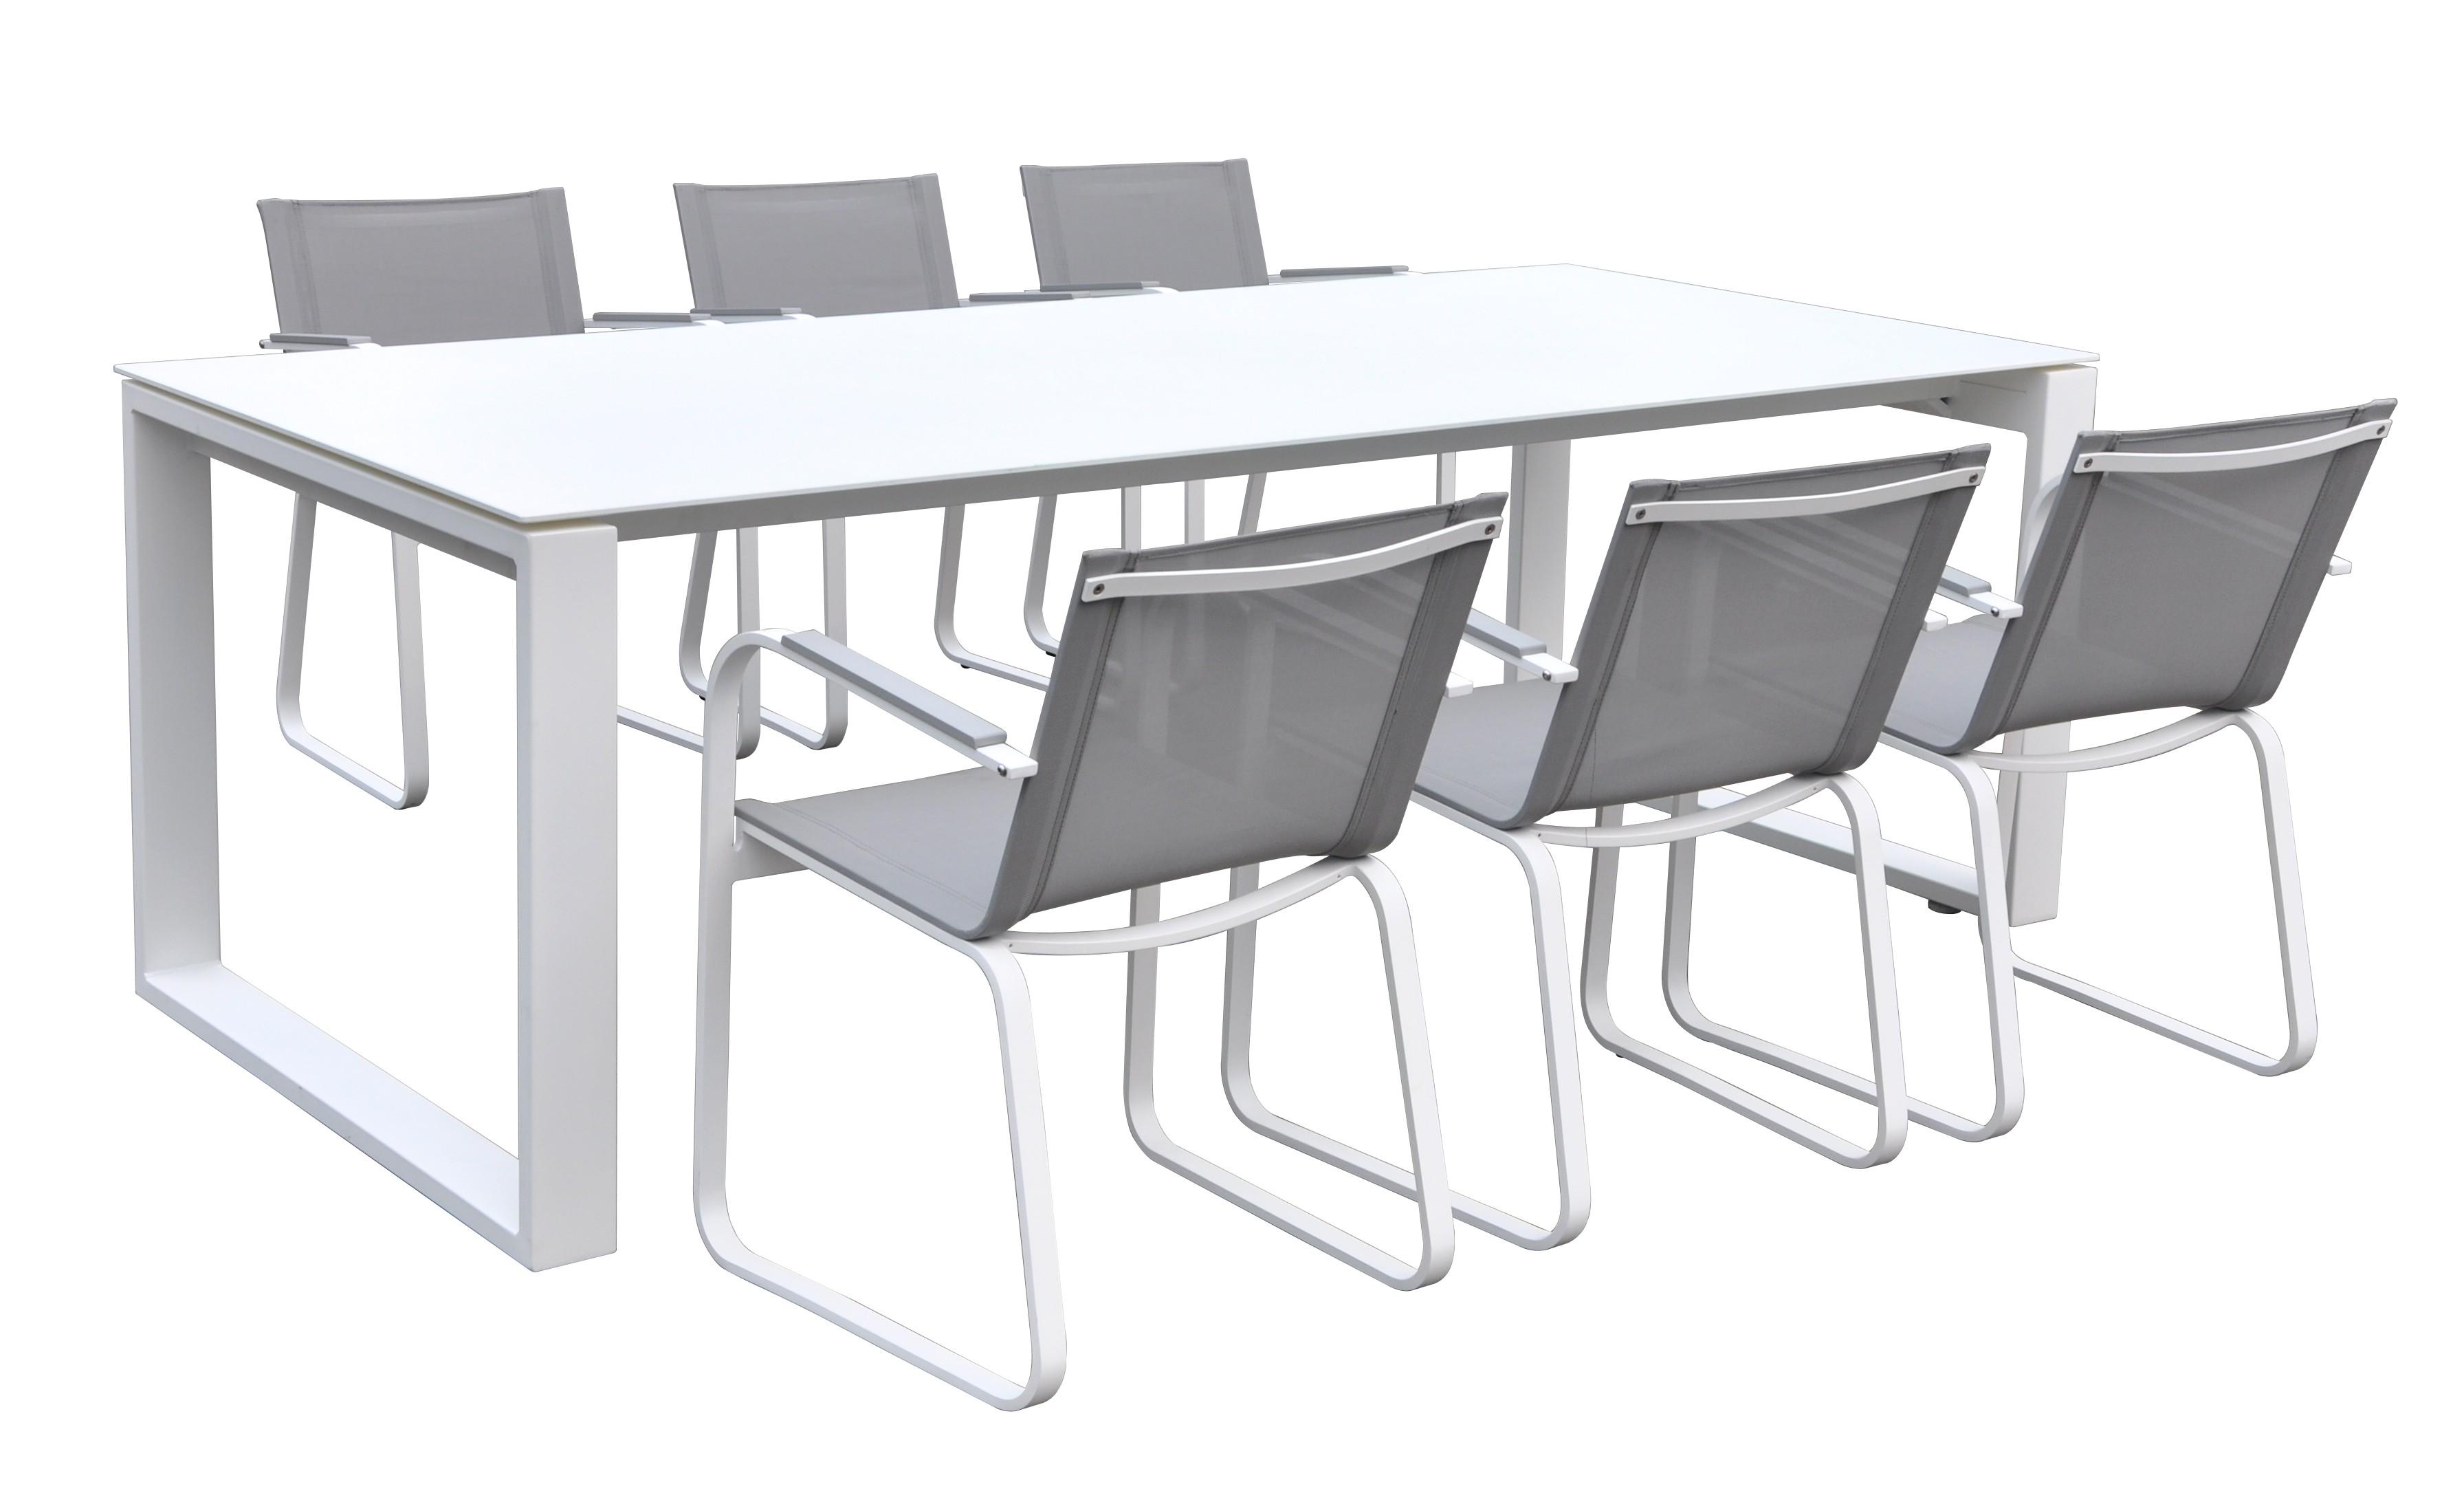 Table De Jardin Aluminium Haut De Gamme Des Id Es Int Ressantes Pour La